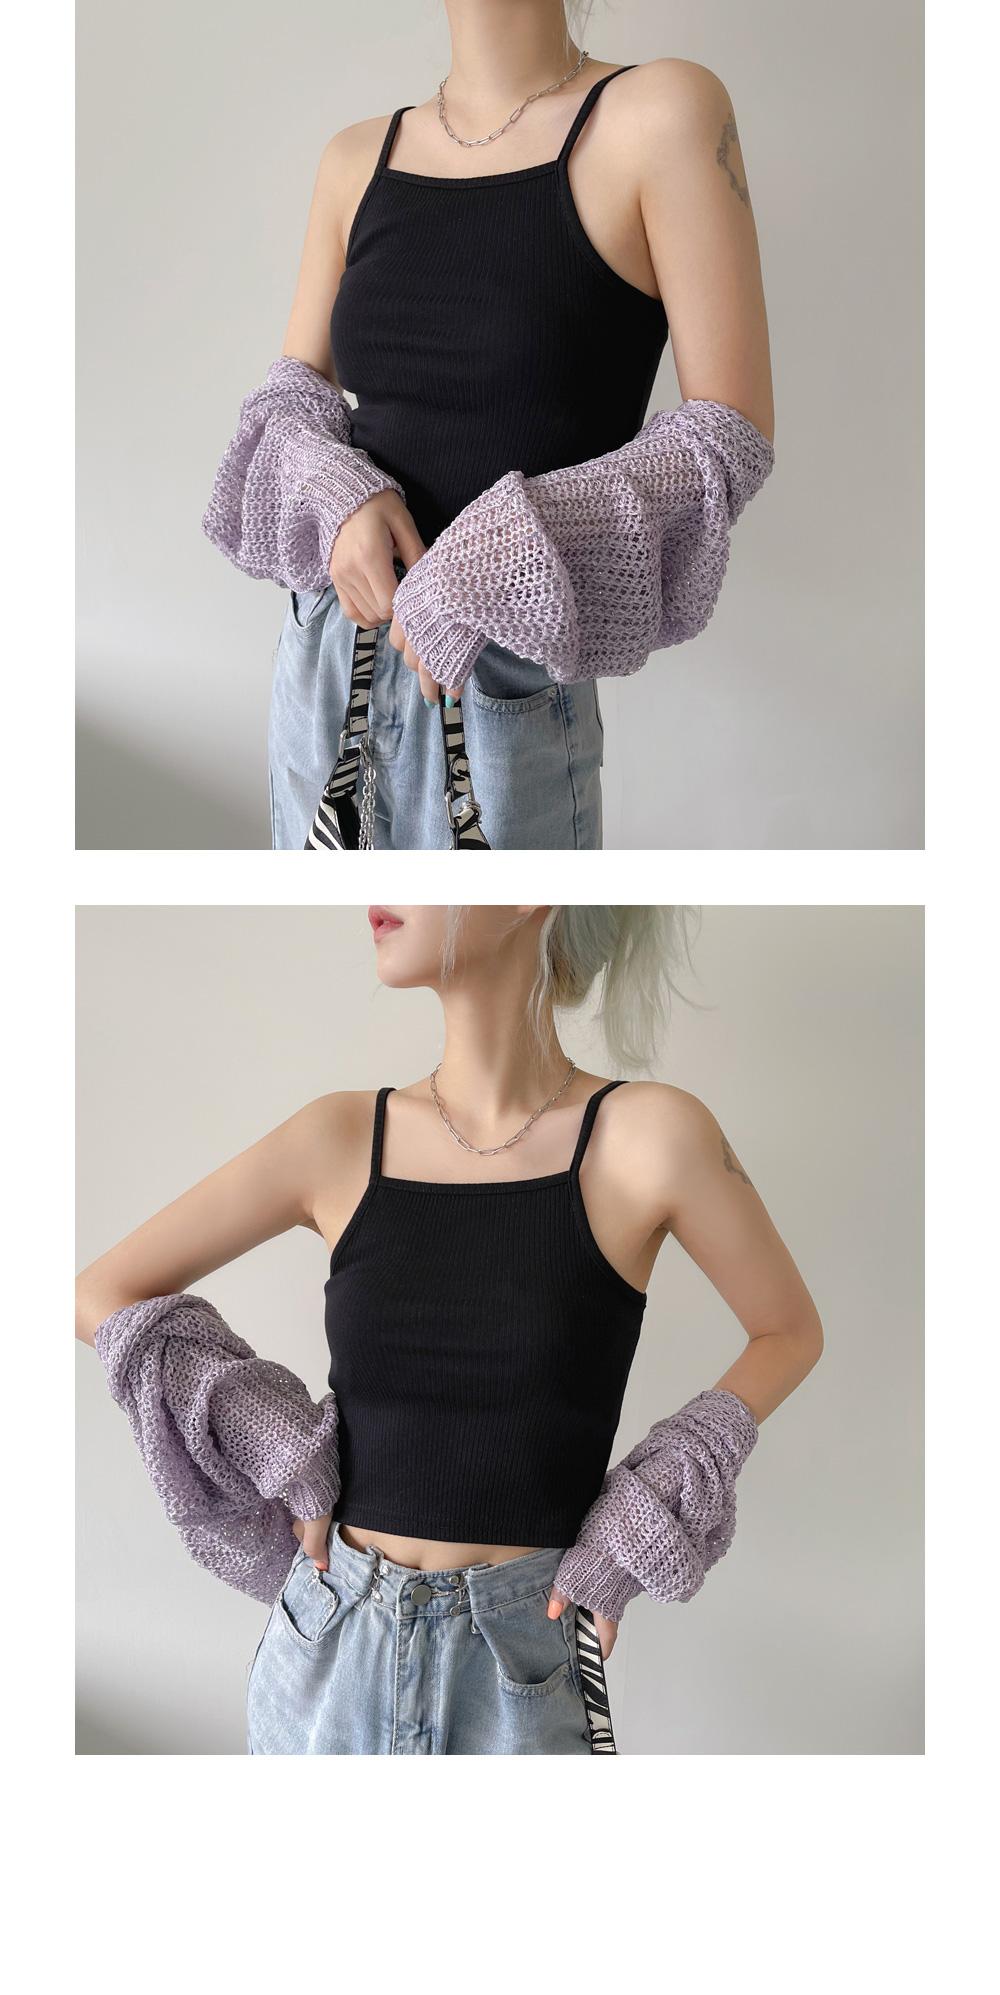 Roico Summer Bolero Knitwear Cardigan